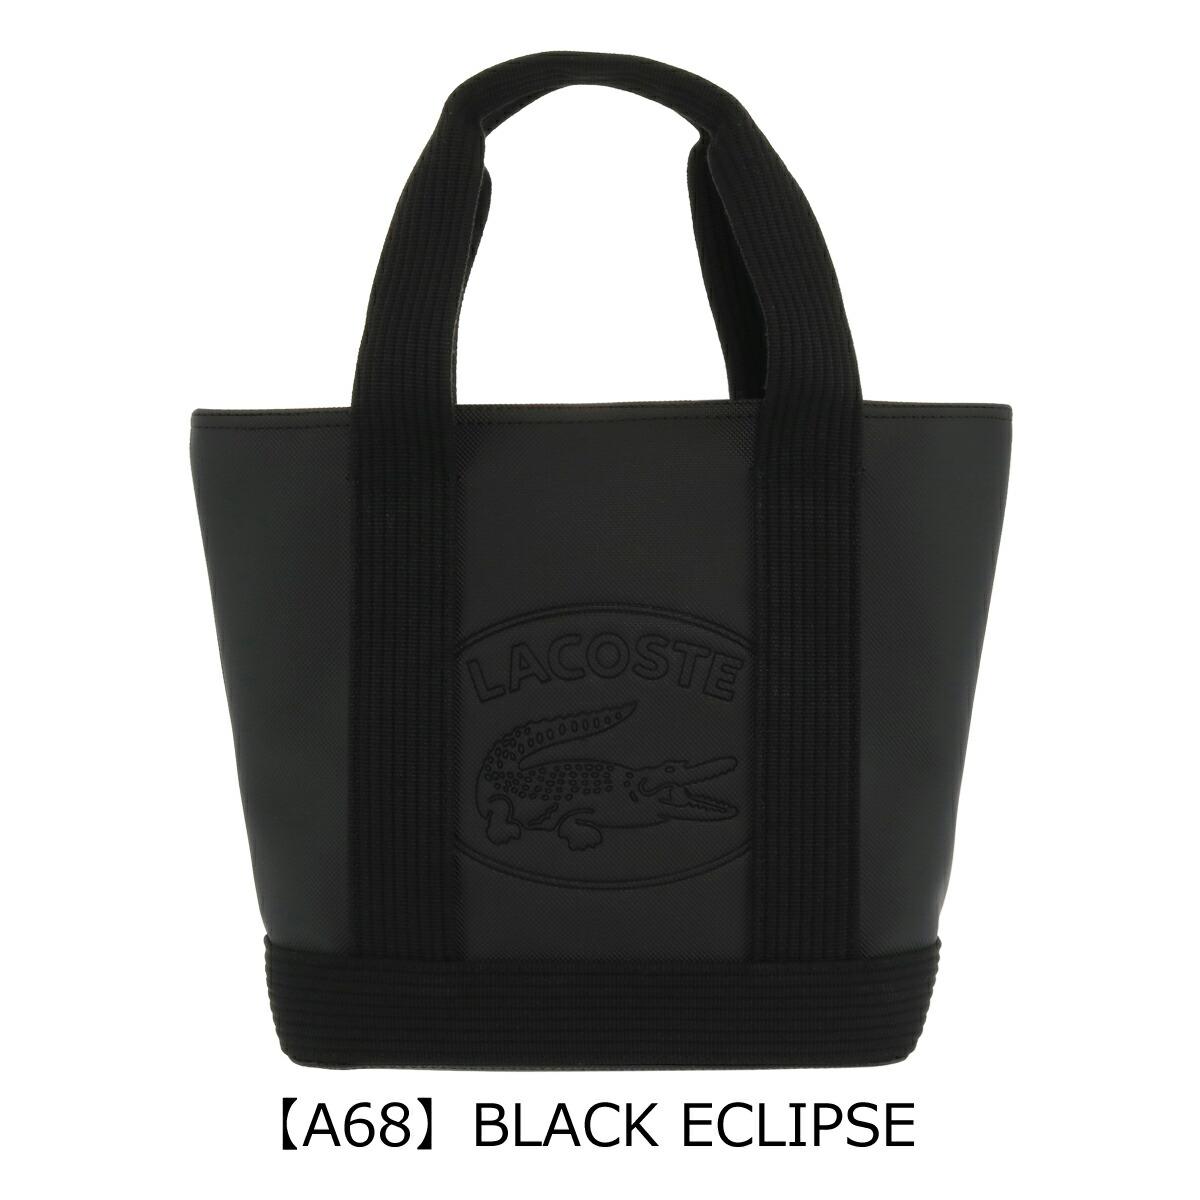 【A68】BLACK ECLIPSE